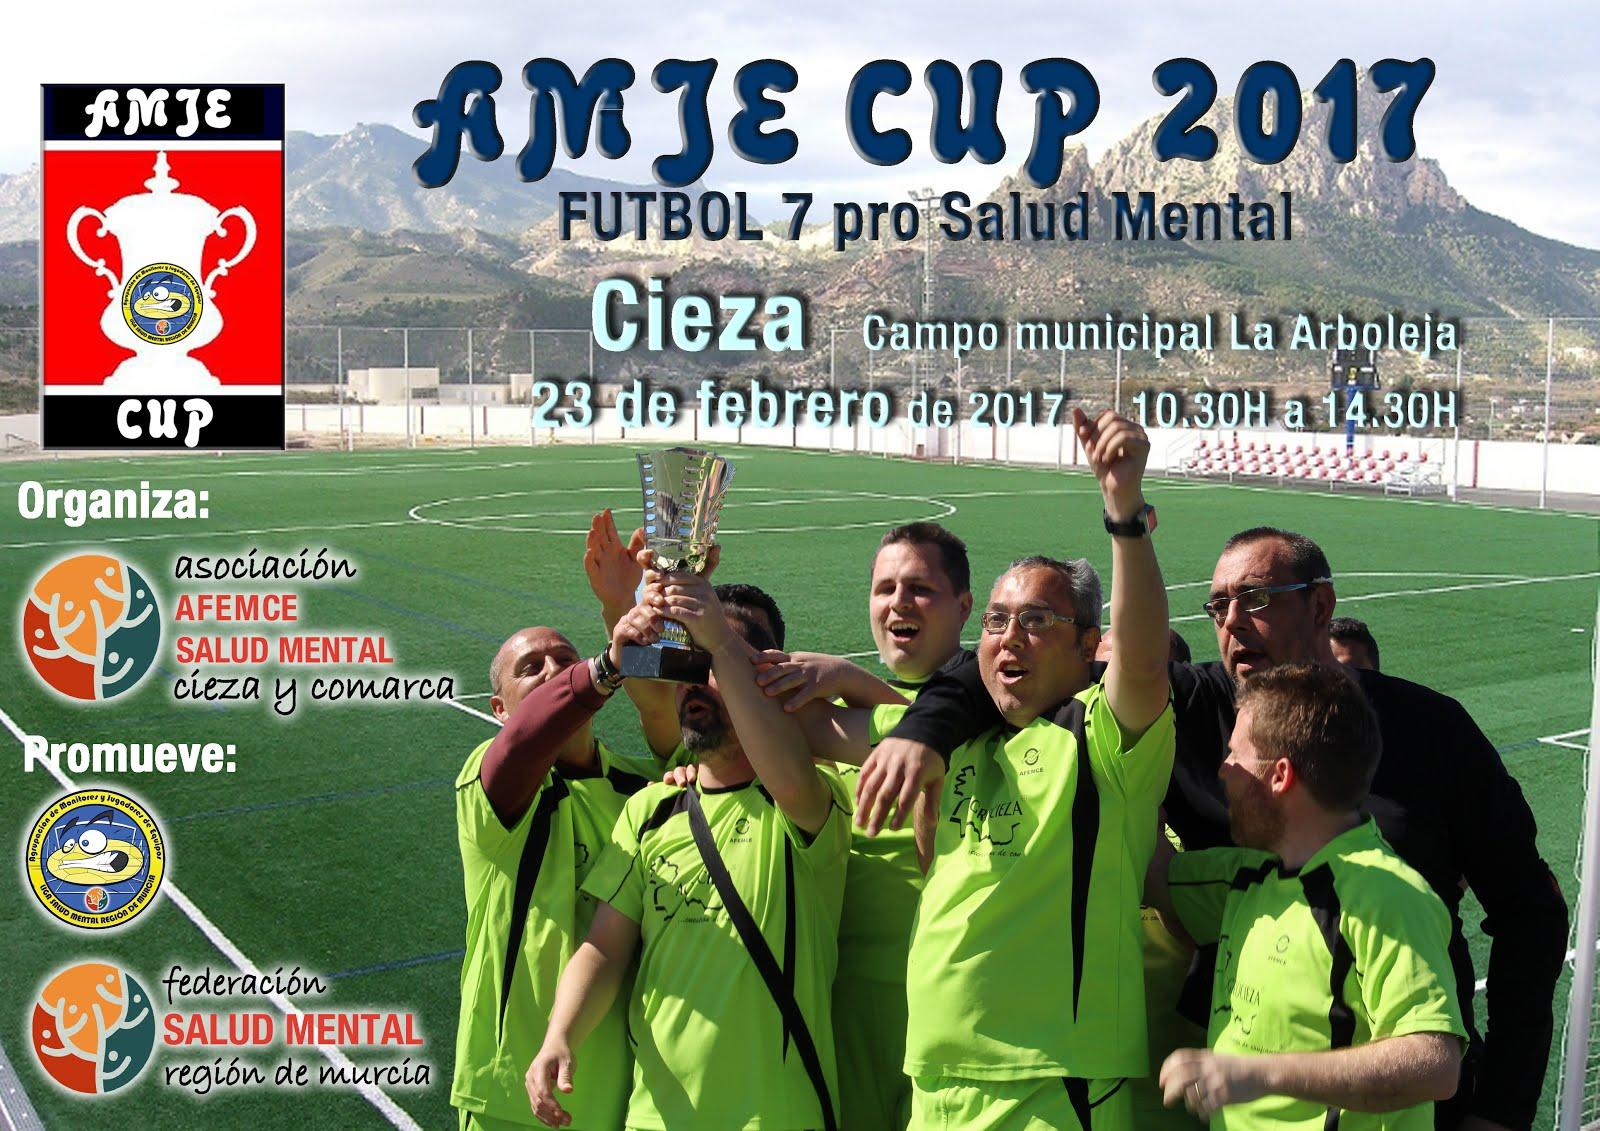 AMJE CUP 2017